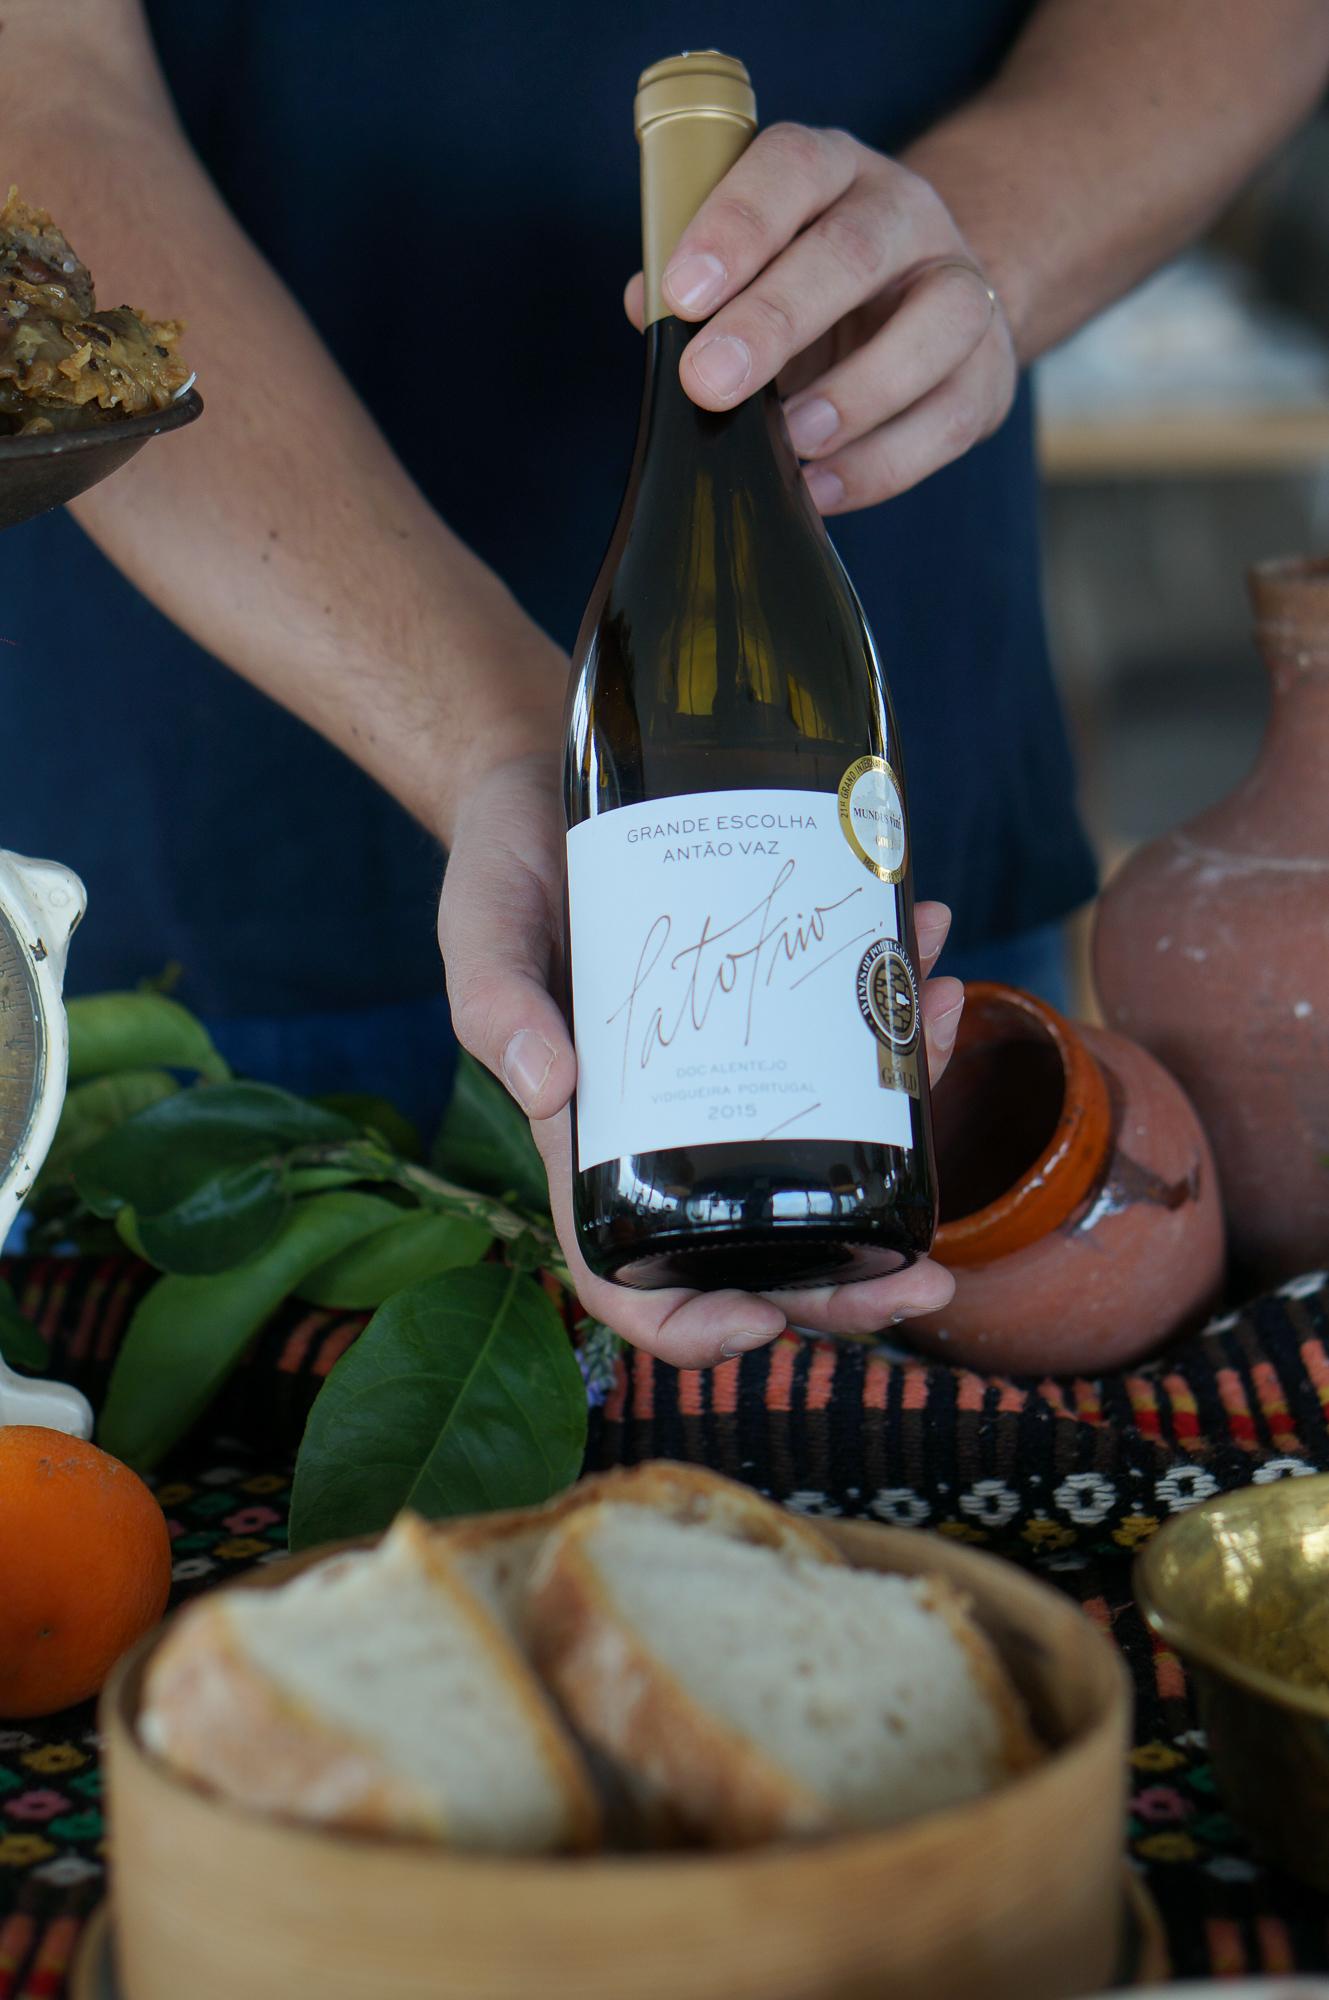 Ribafreixo Wines - 6 Wines & Regional Products